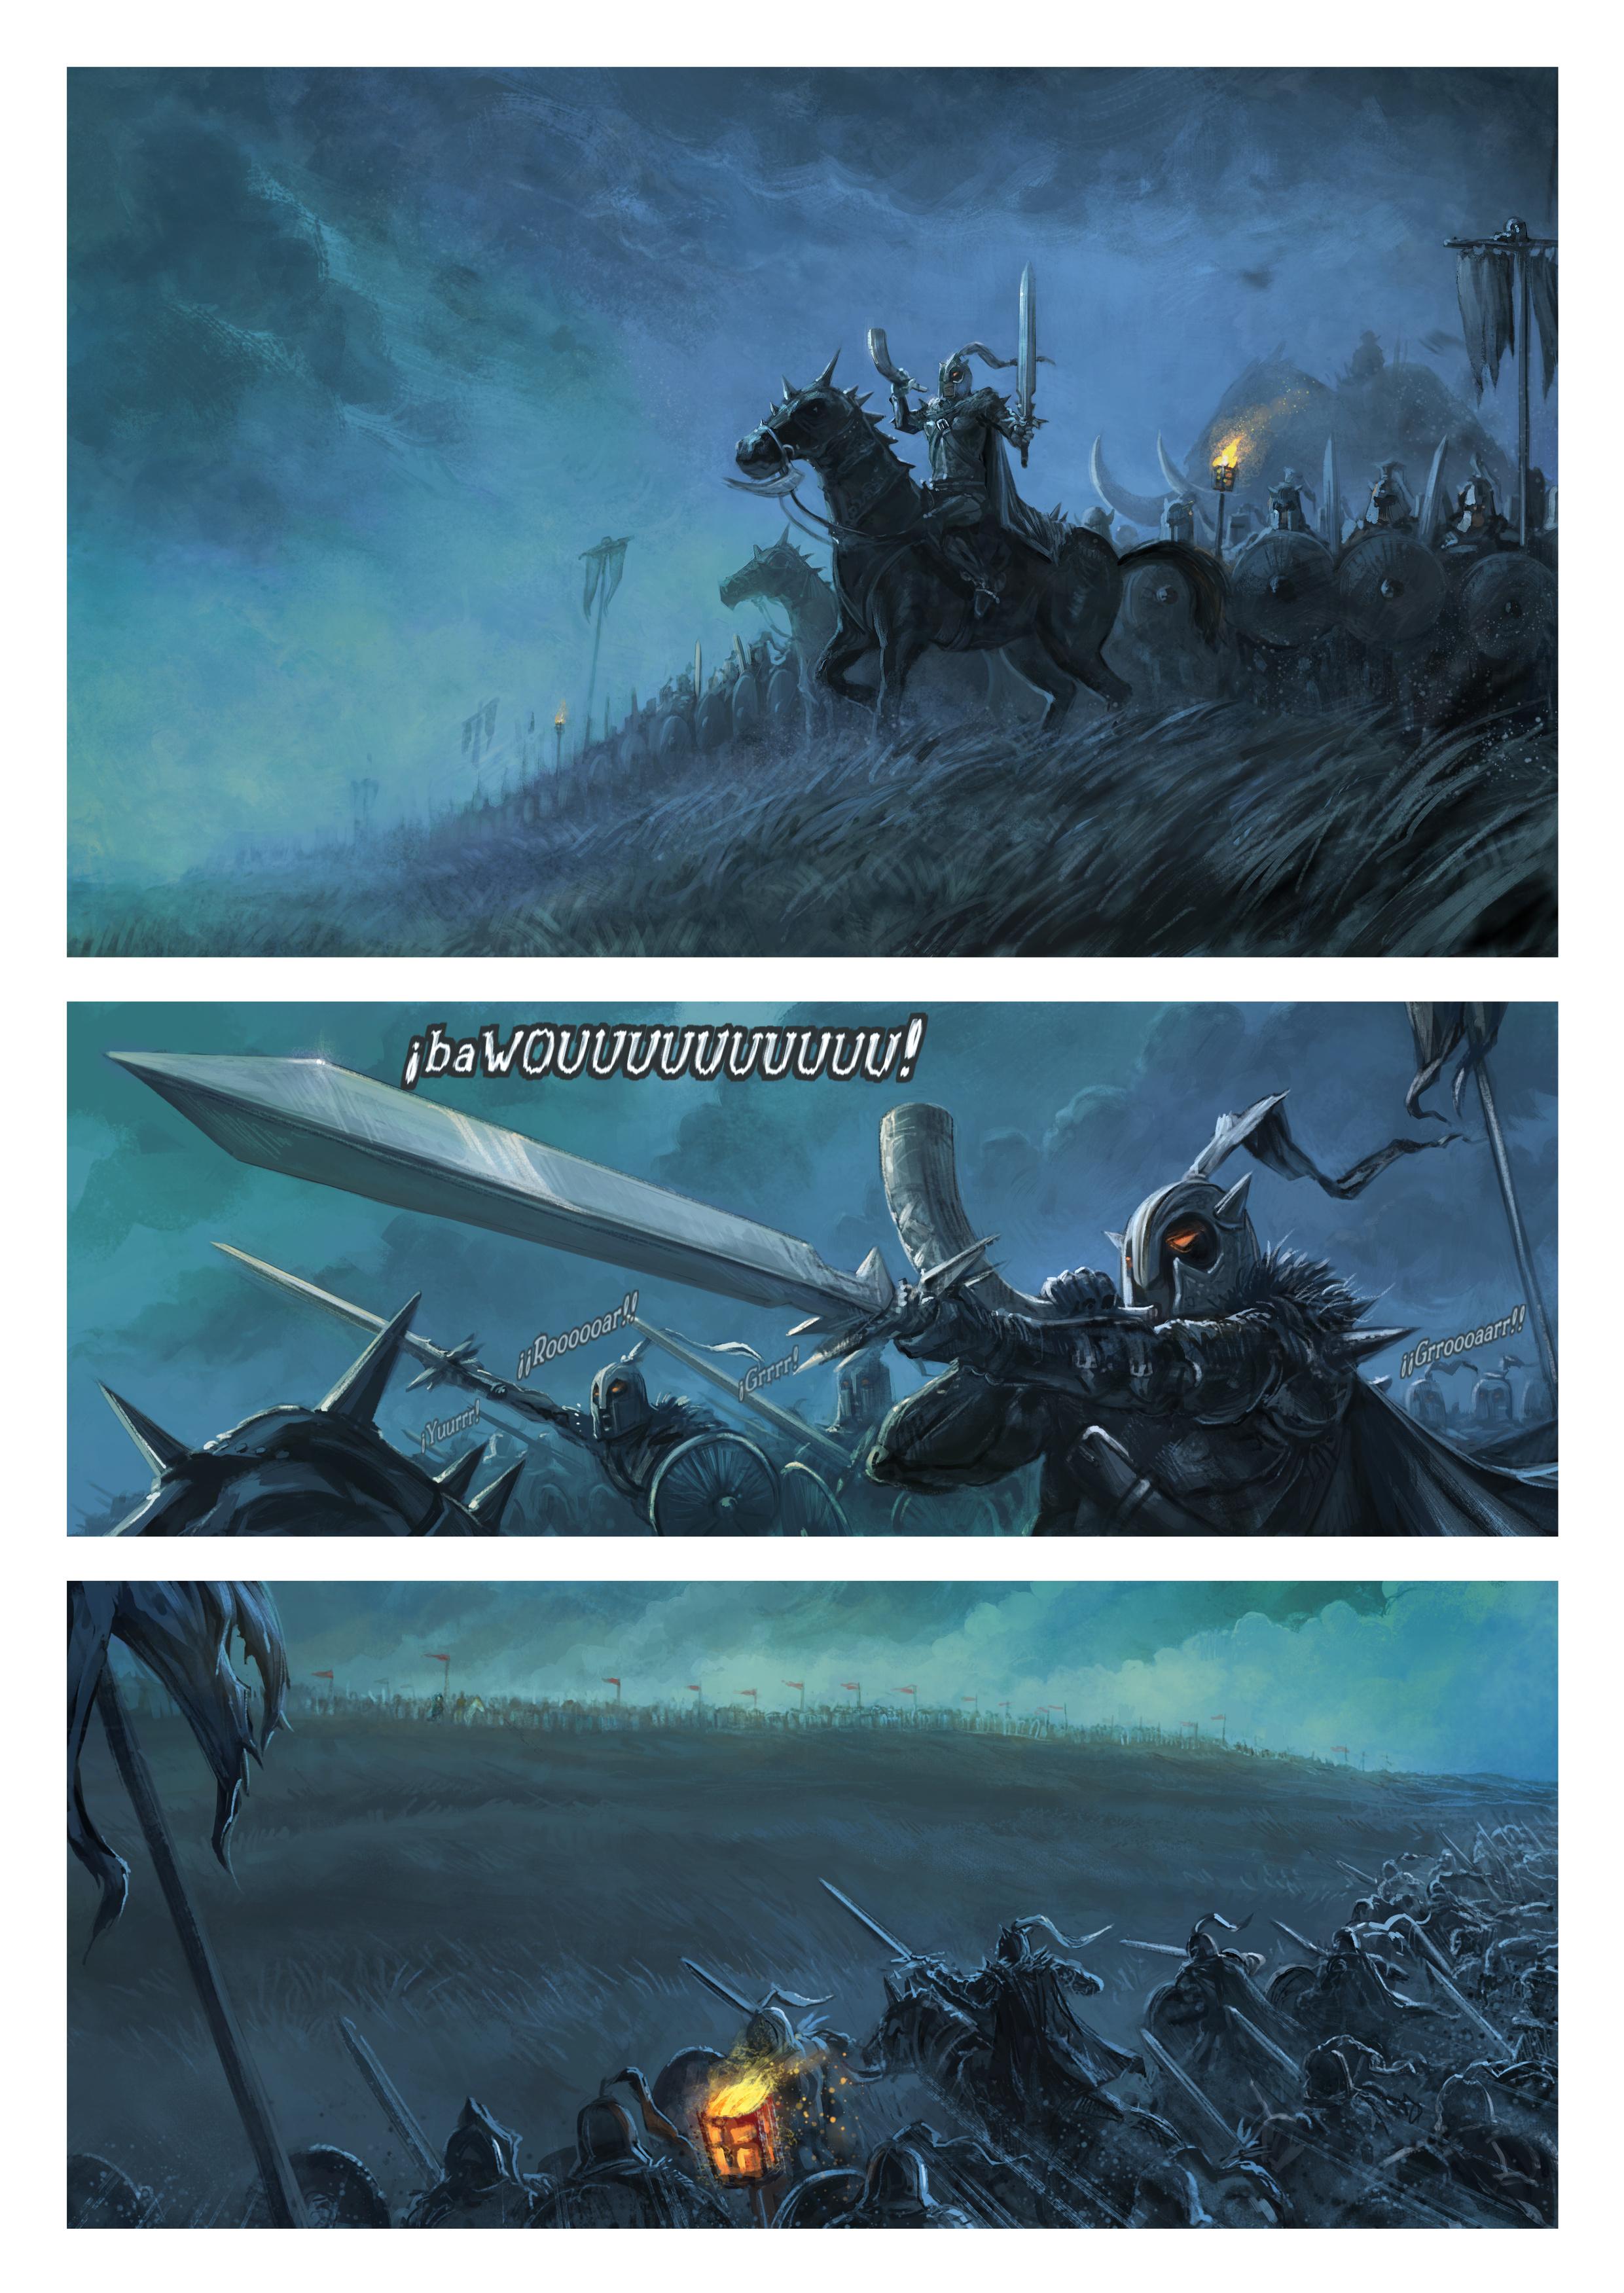 Episodio 33: Hechizo de guerra, Page 1